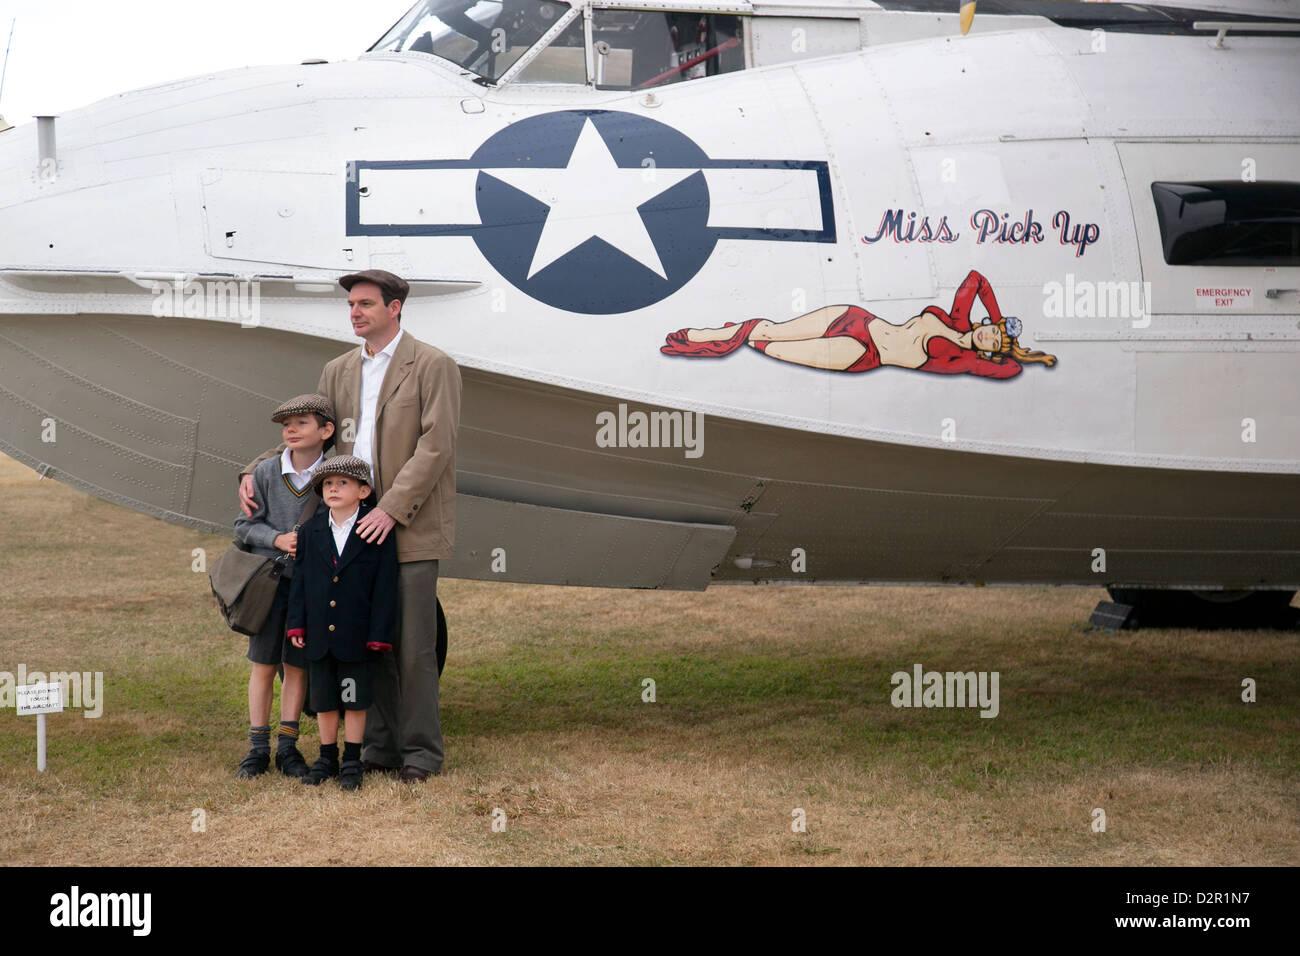 Vater mit Sohn bei der Oldtimer-Flugzeuge-Anzeige am Goodwood Revival meeting Stockbild